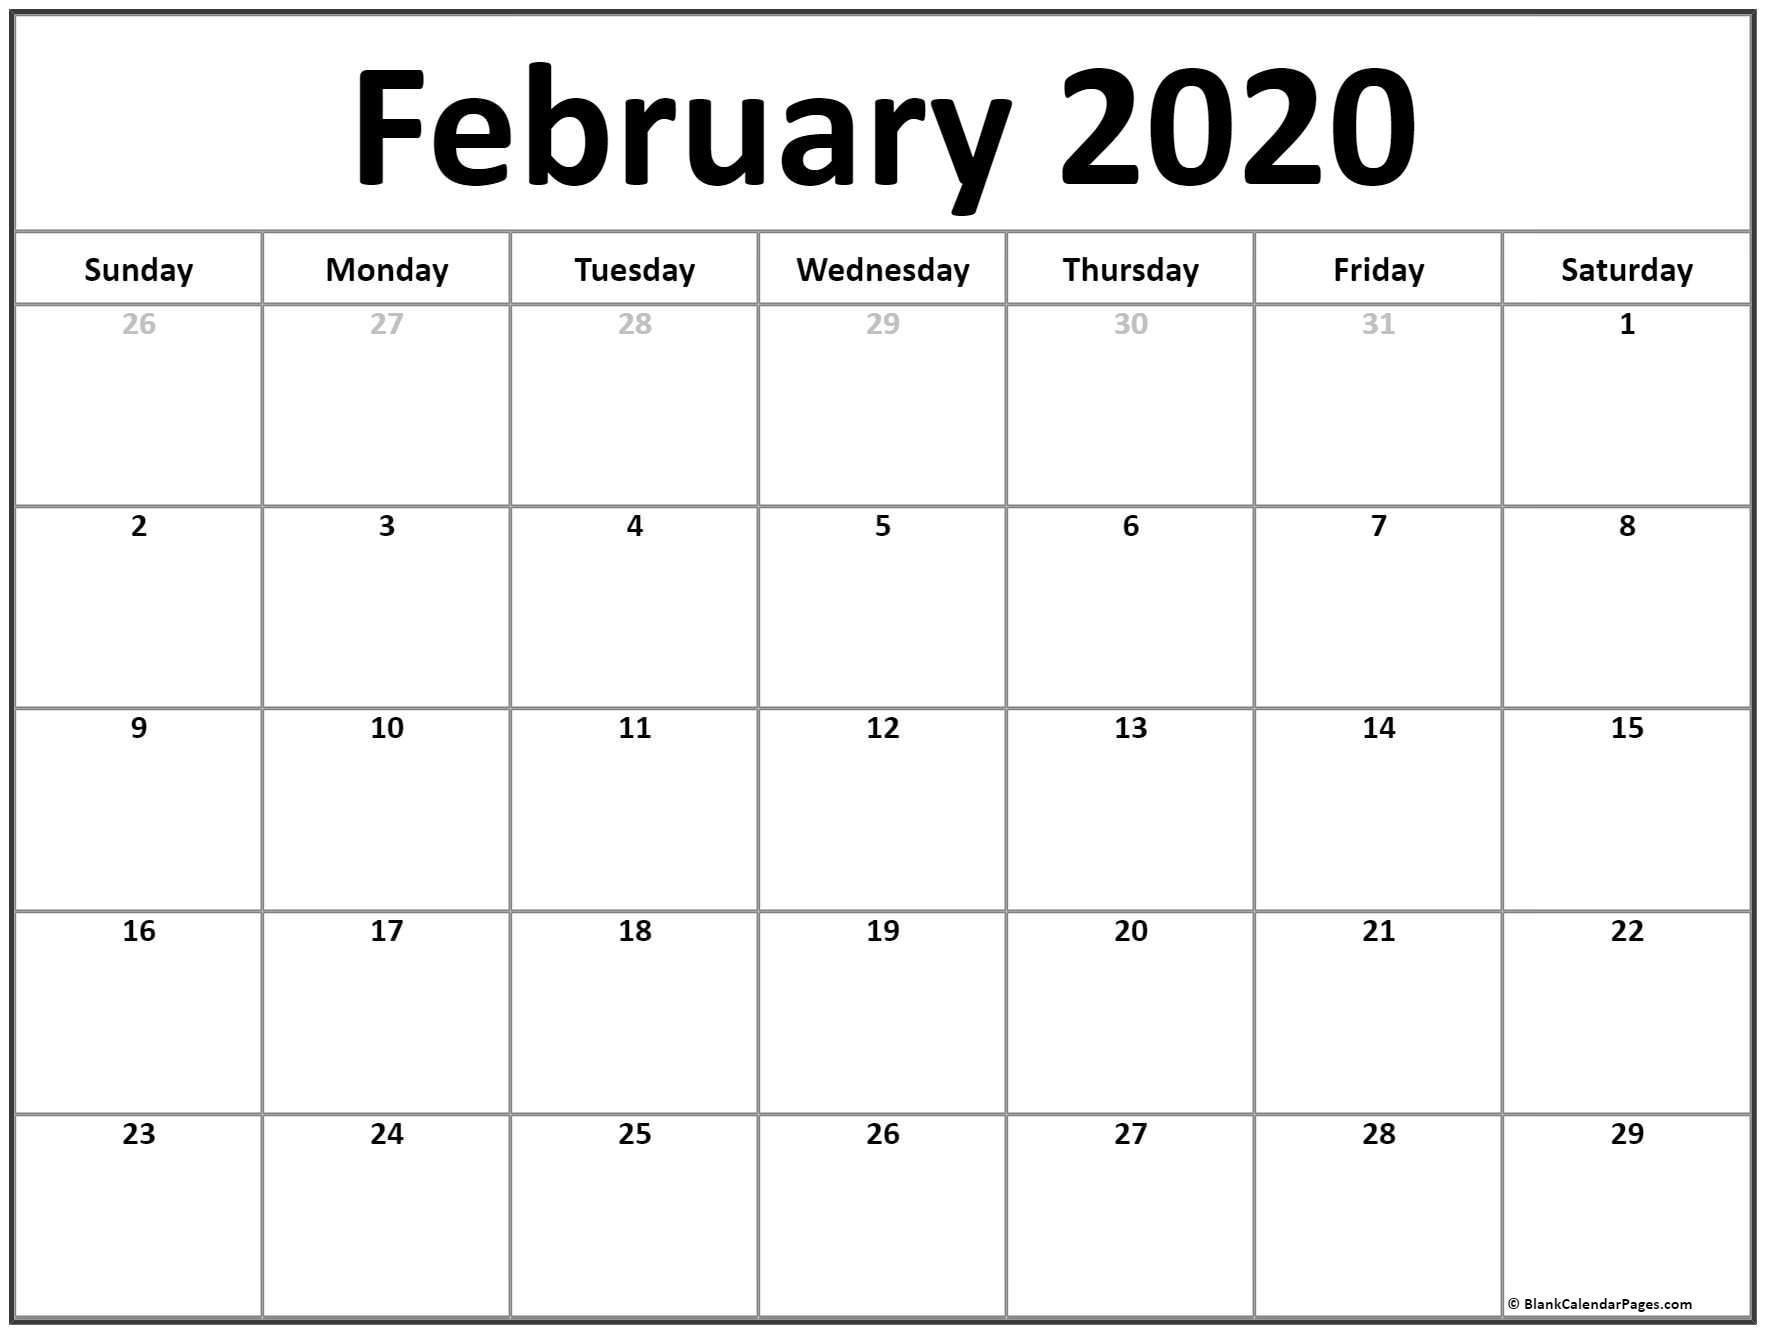 February 2020 Printable Calendars February 2020 Calendar